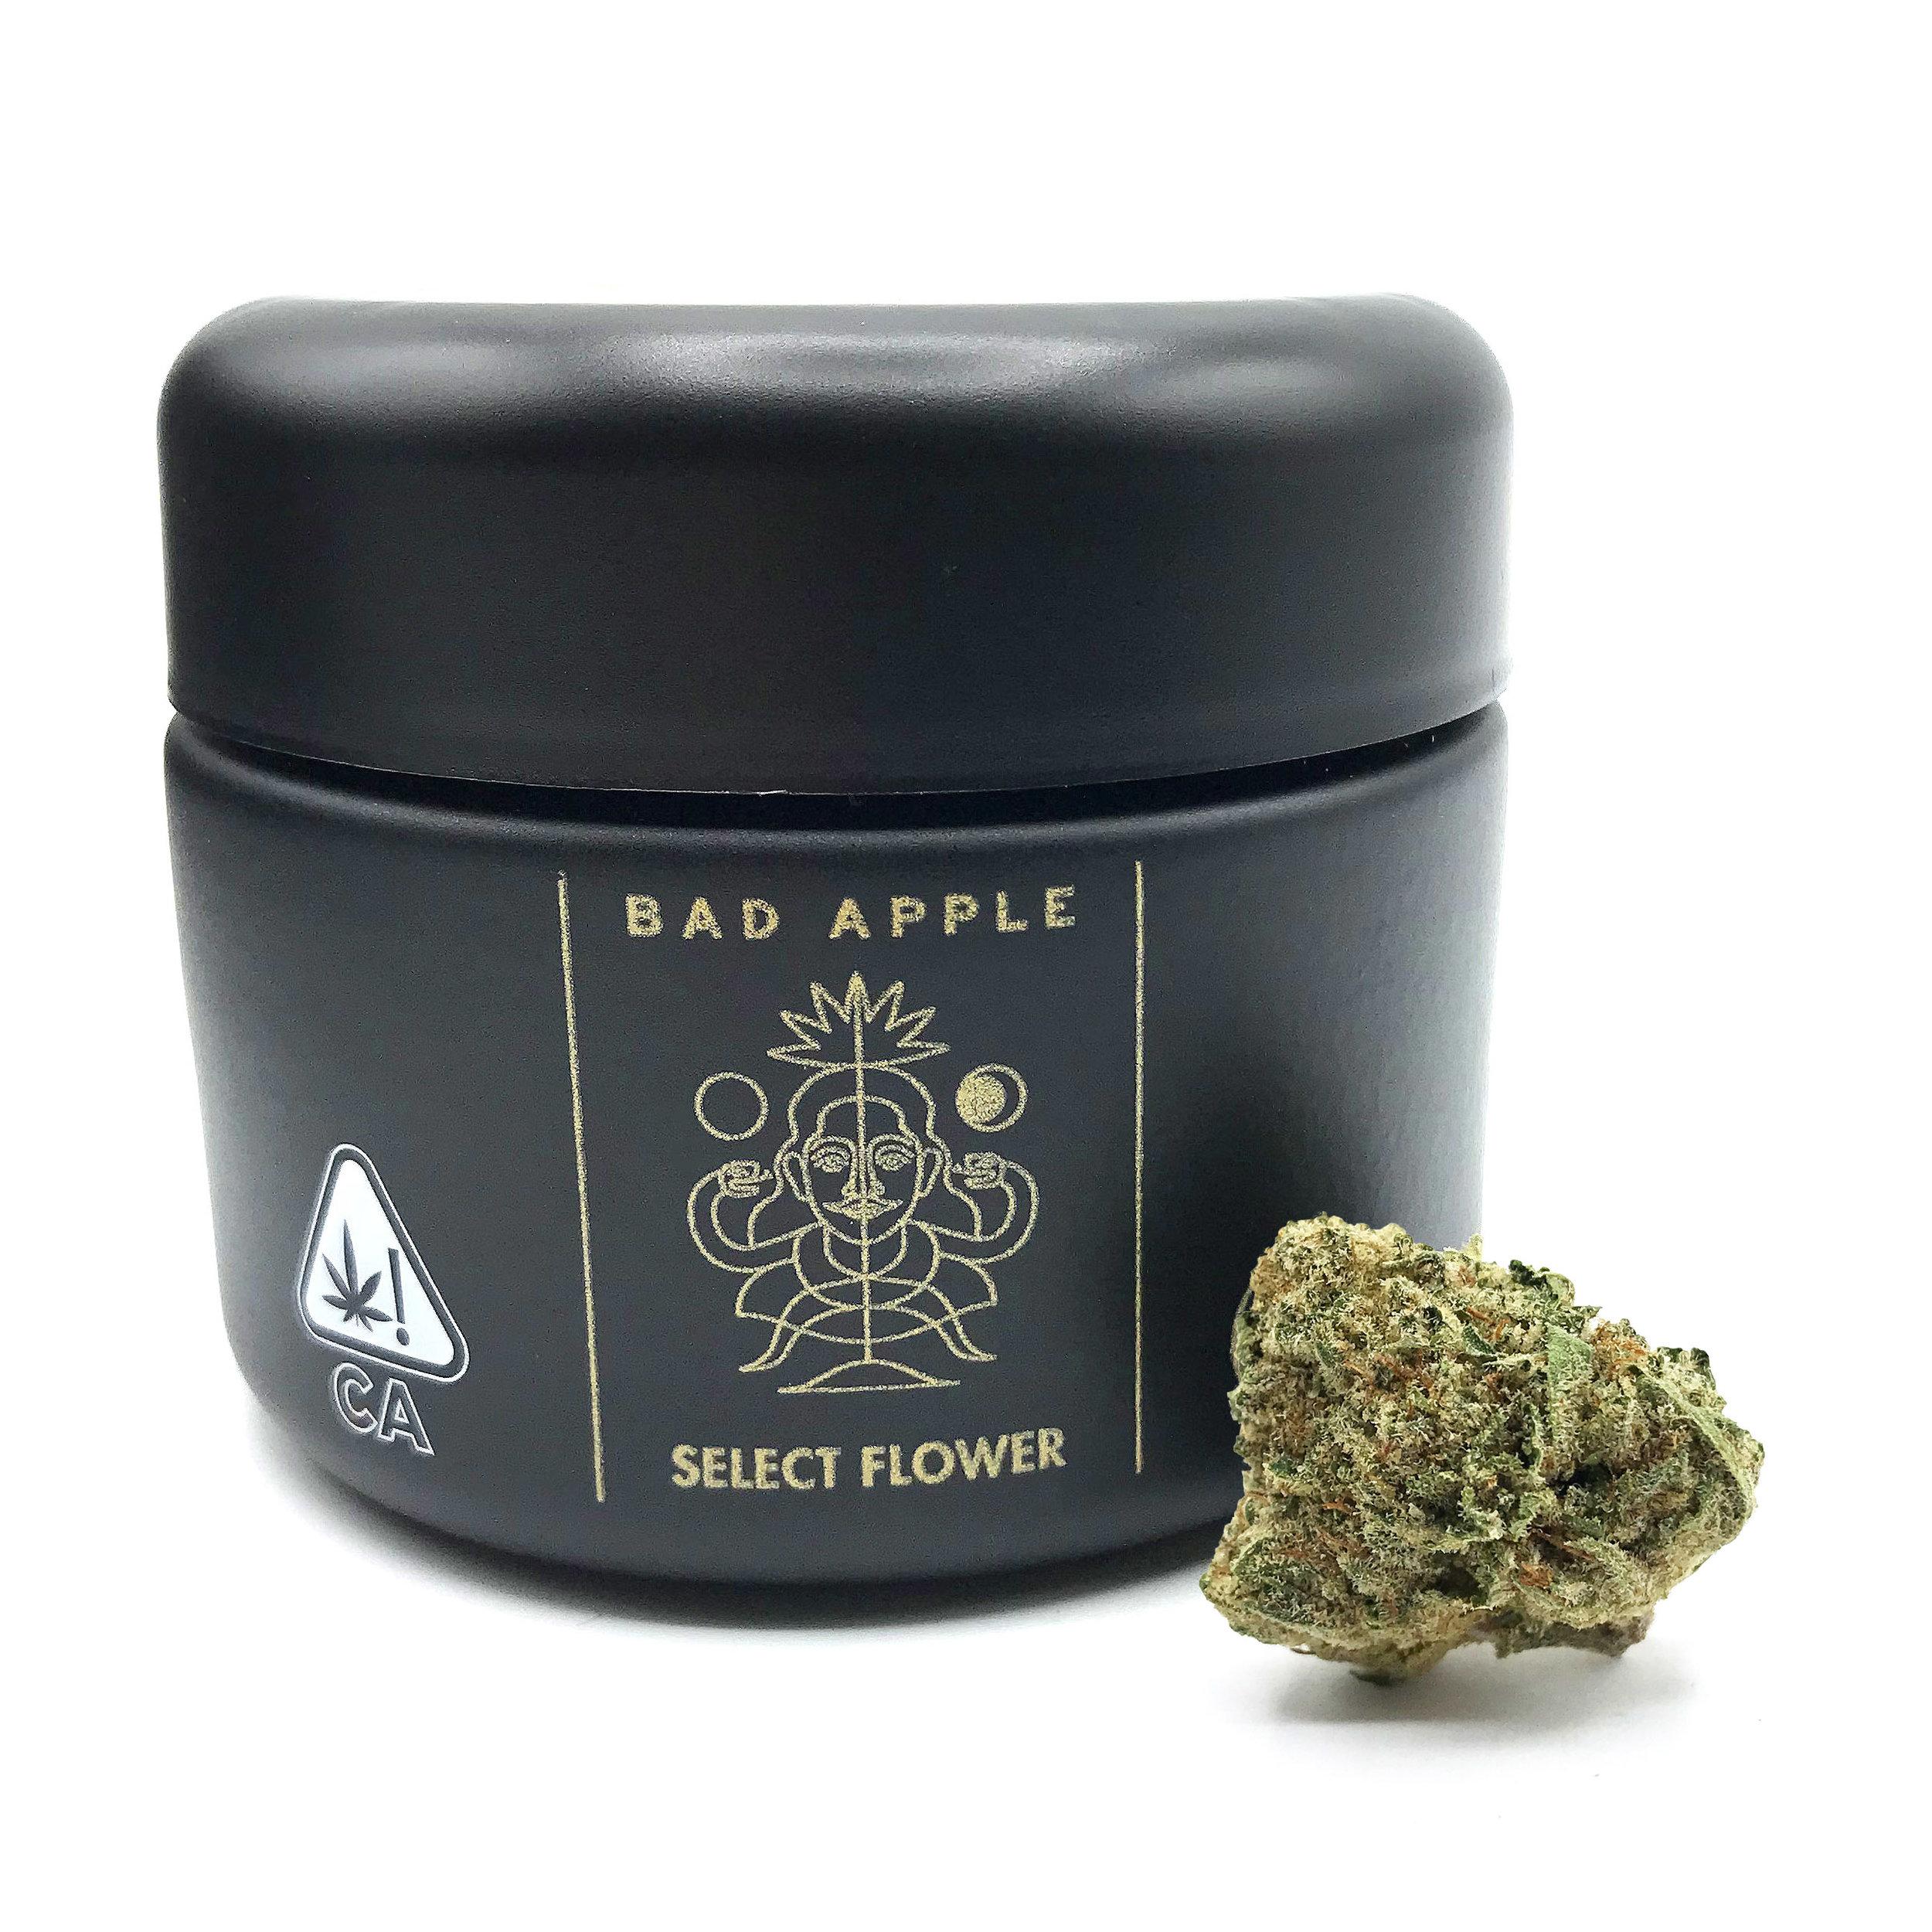 Bad Apple Hades OG - Jar.jpg.jpg